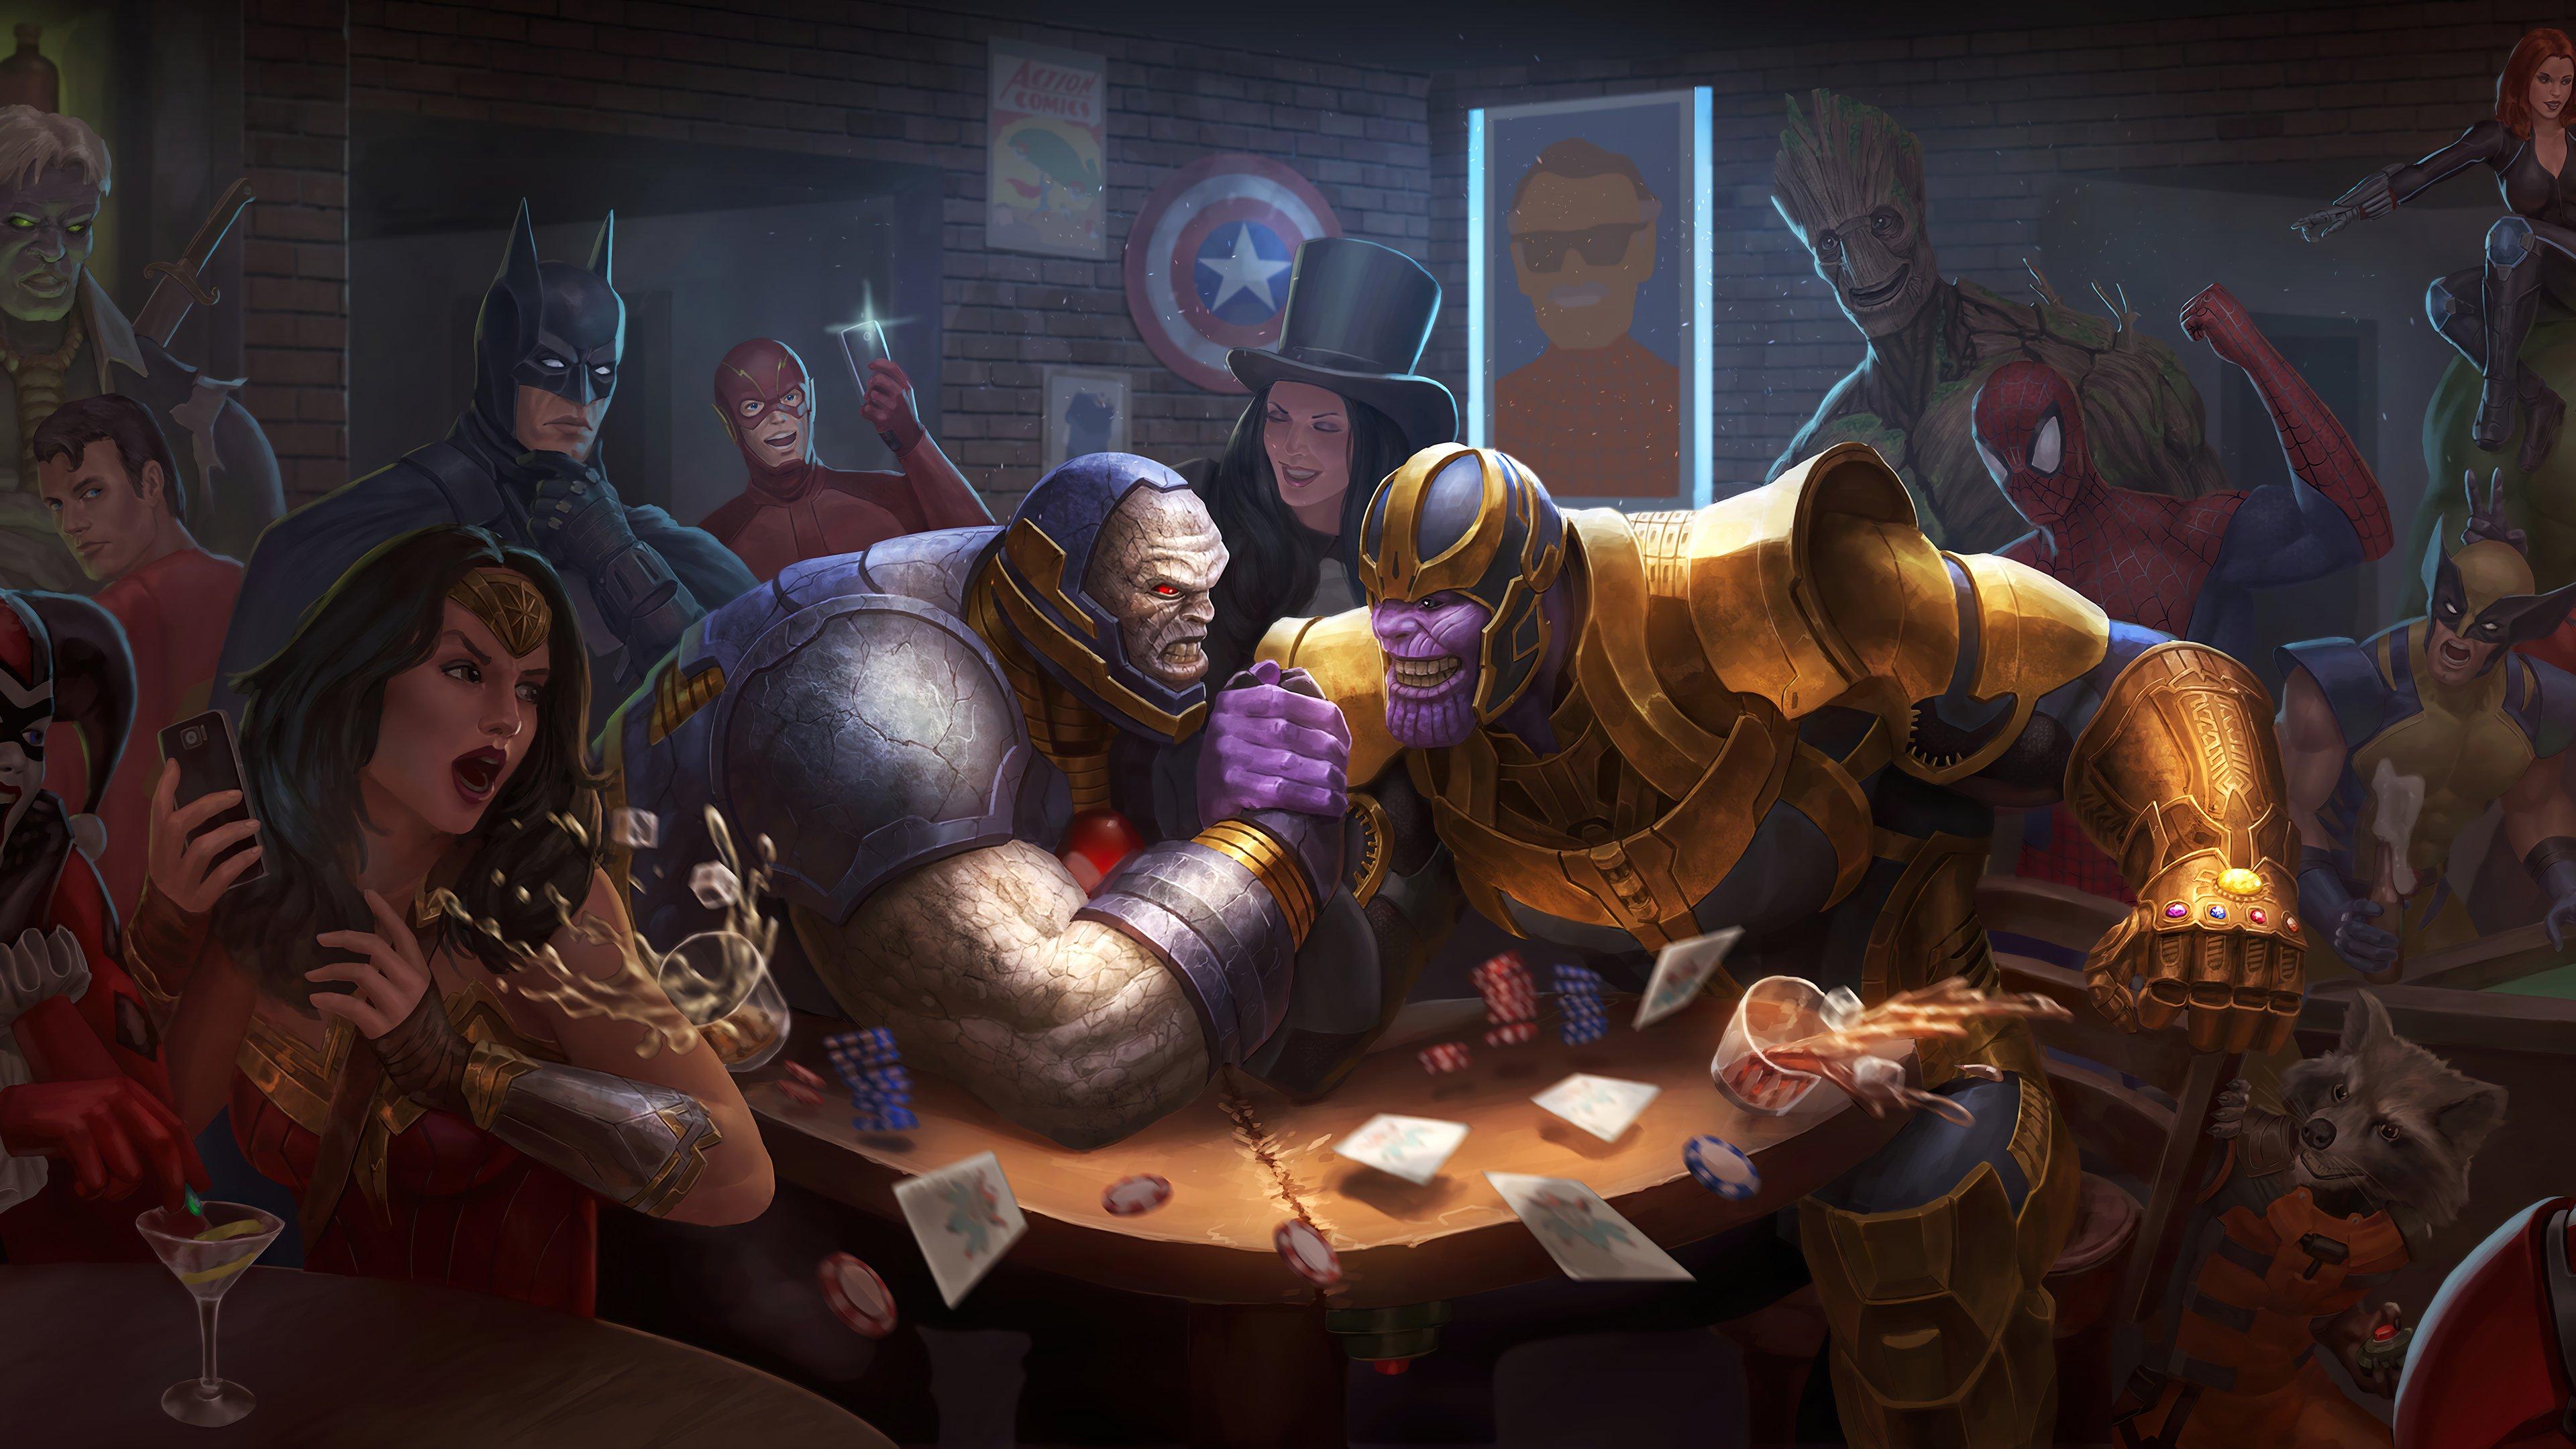 Wallpaper Darksaid vs Thanos in bar